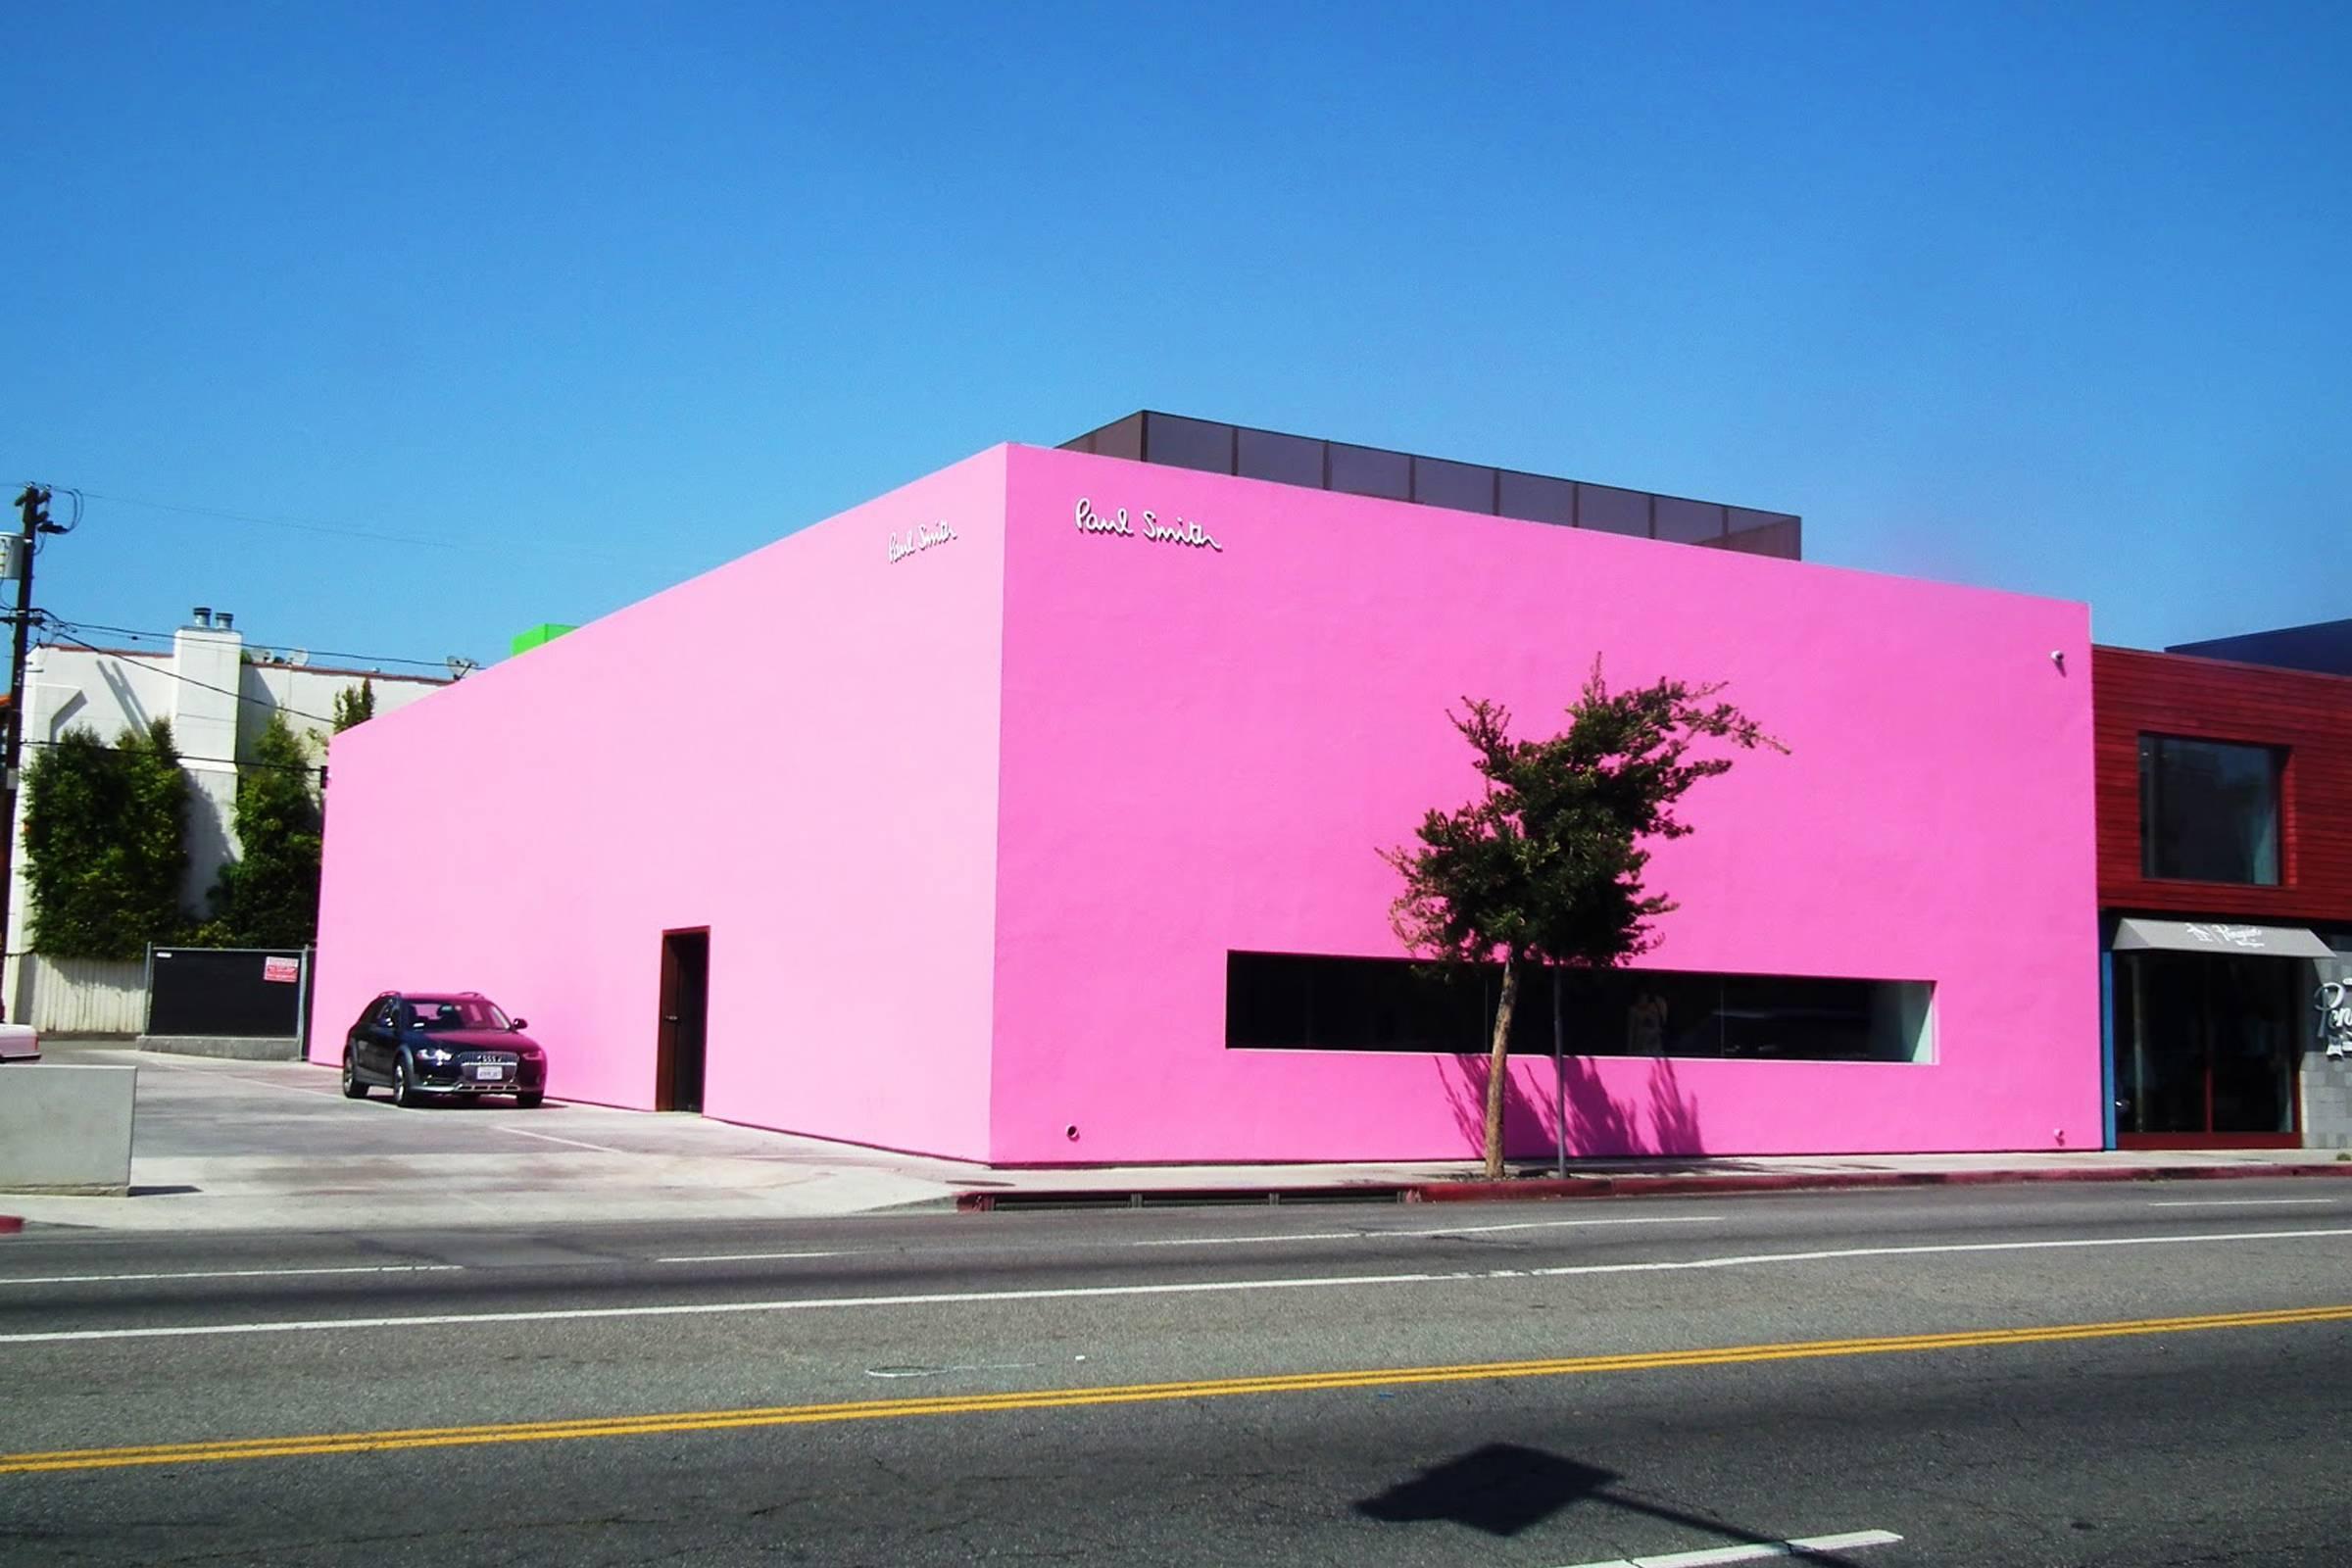 Paul Smith's Los Angeles Retail Location